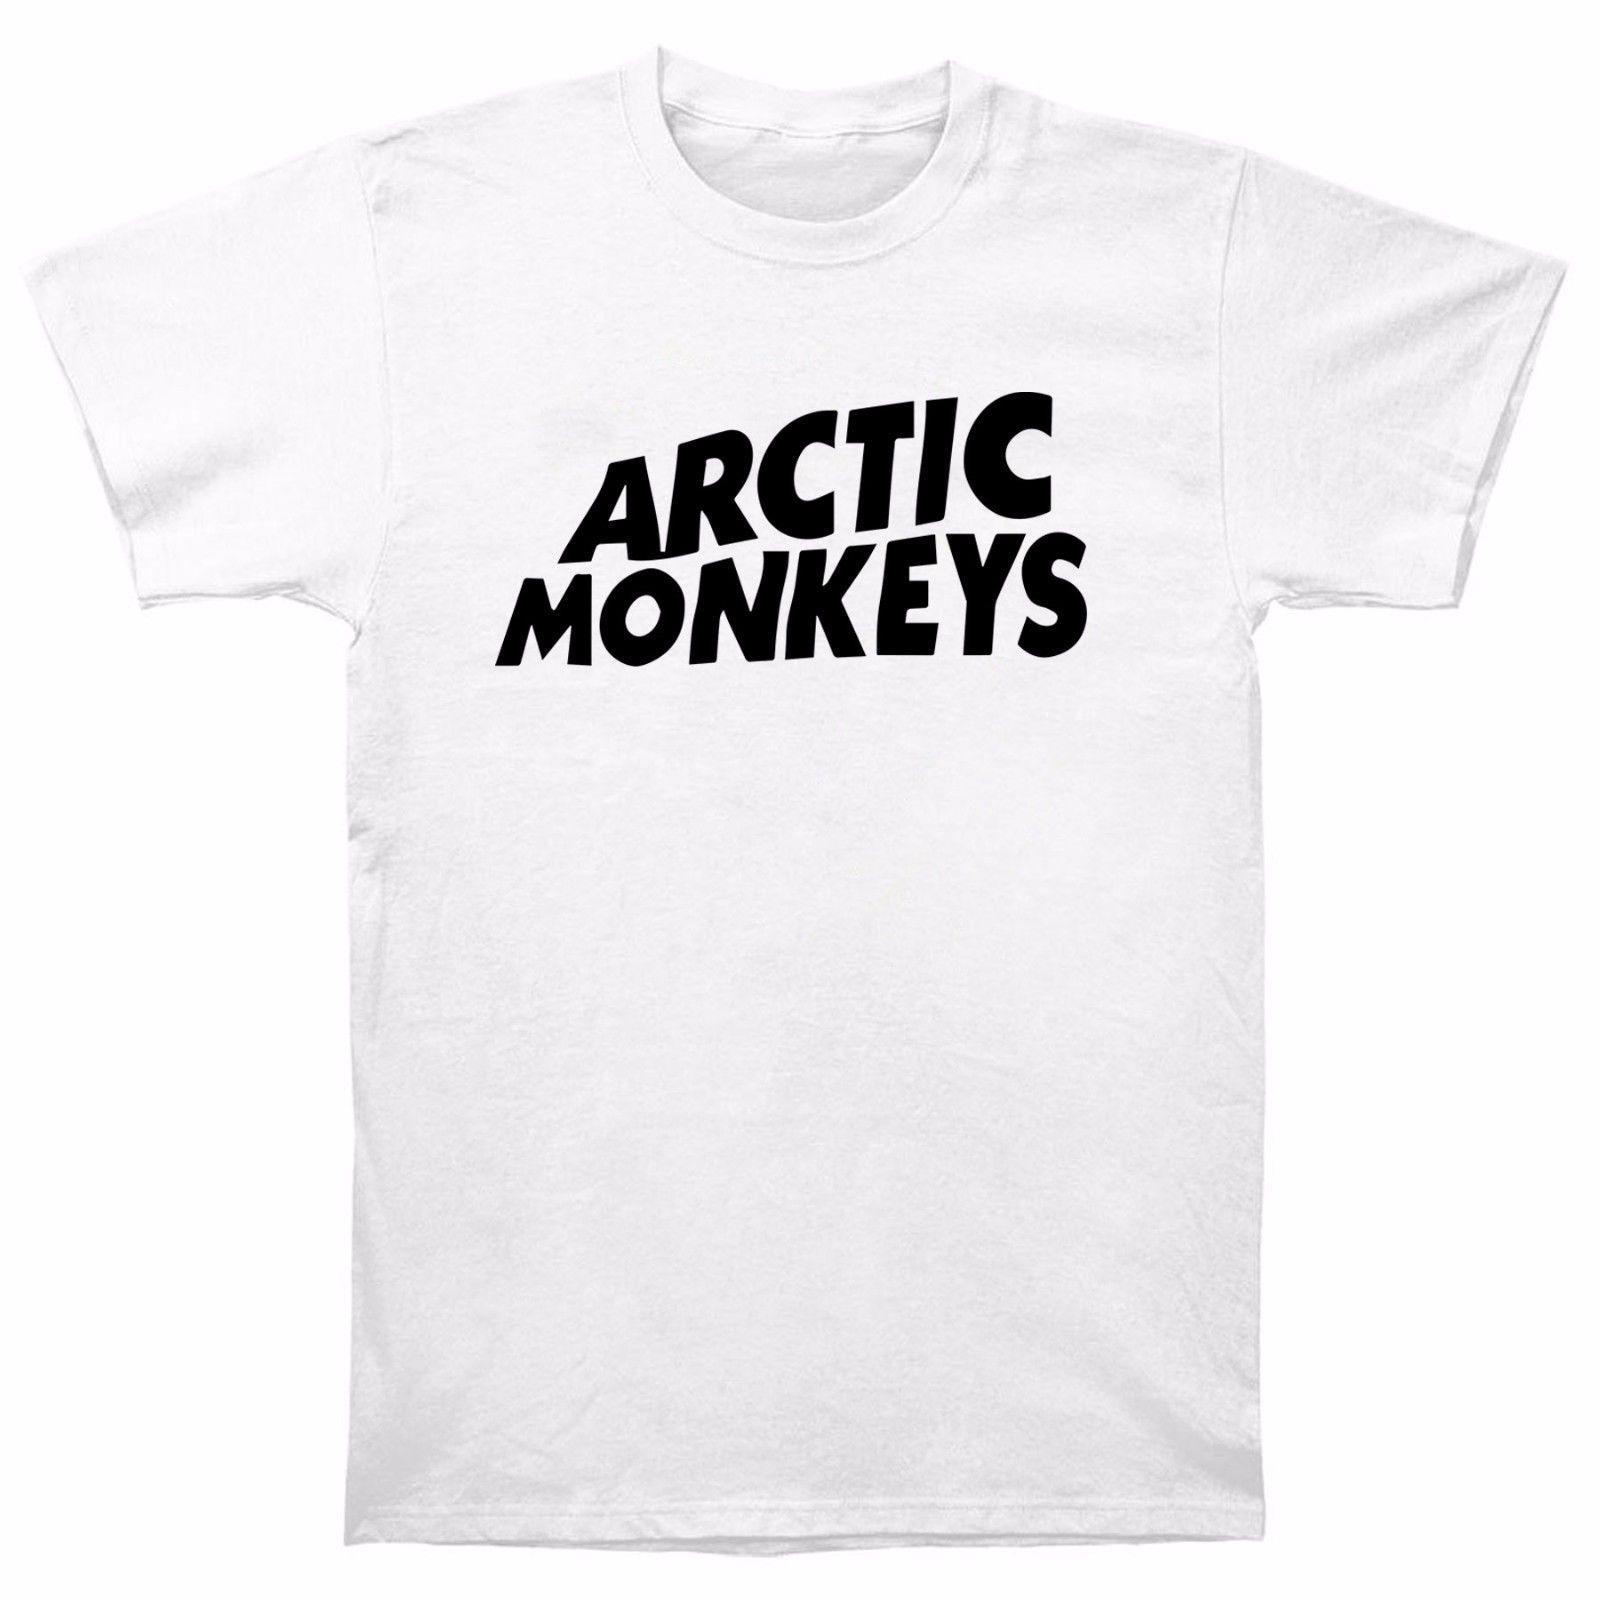 Buy Band Shirts Cheap   Top Mode Depot